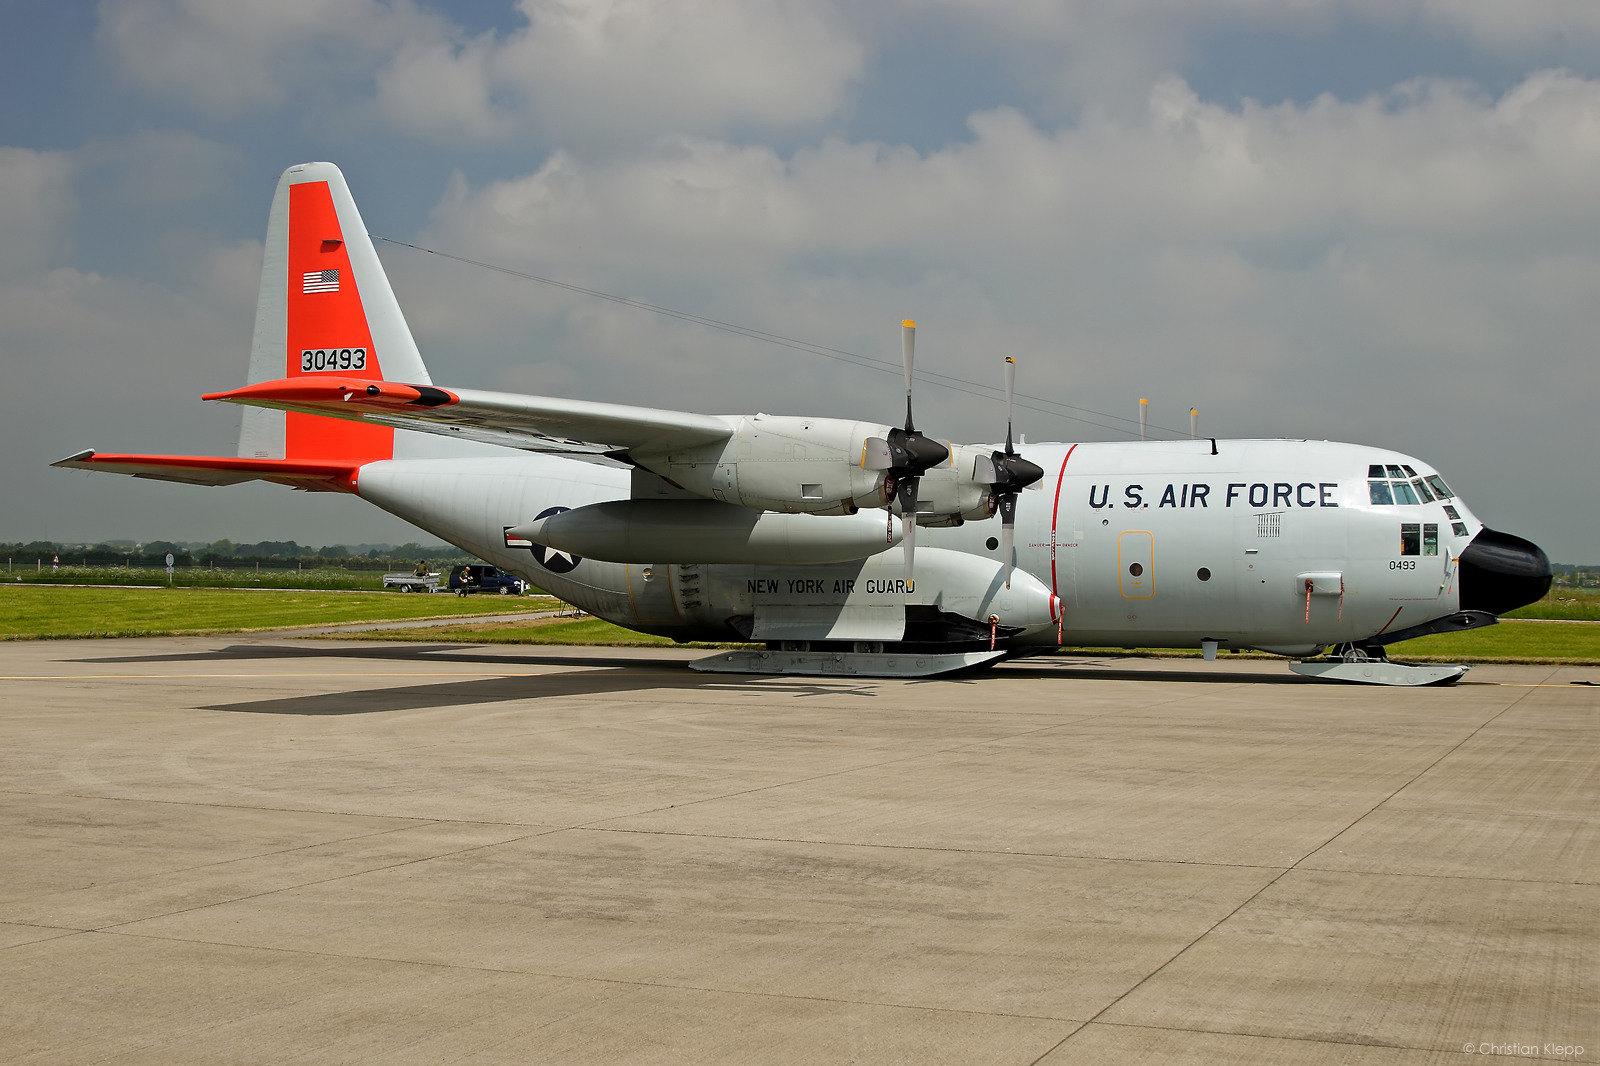 [Bild: USAF30493.jpg]